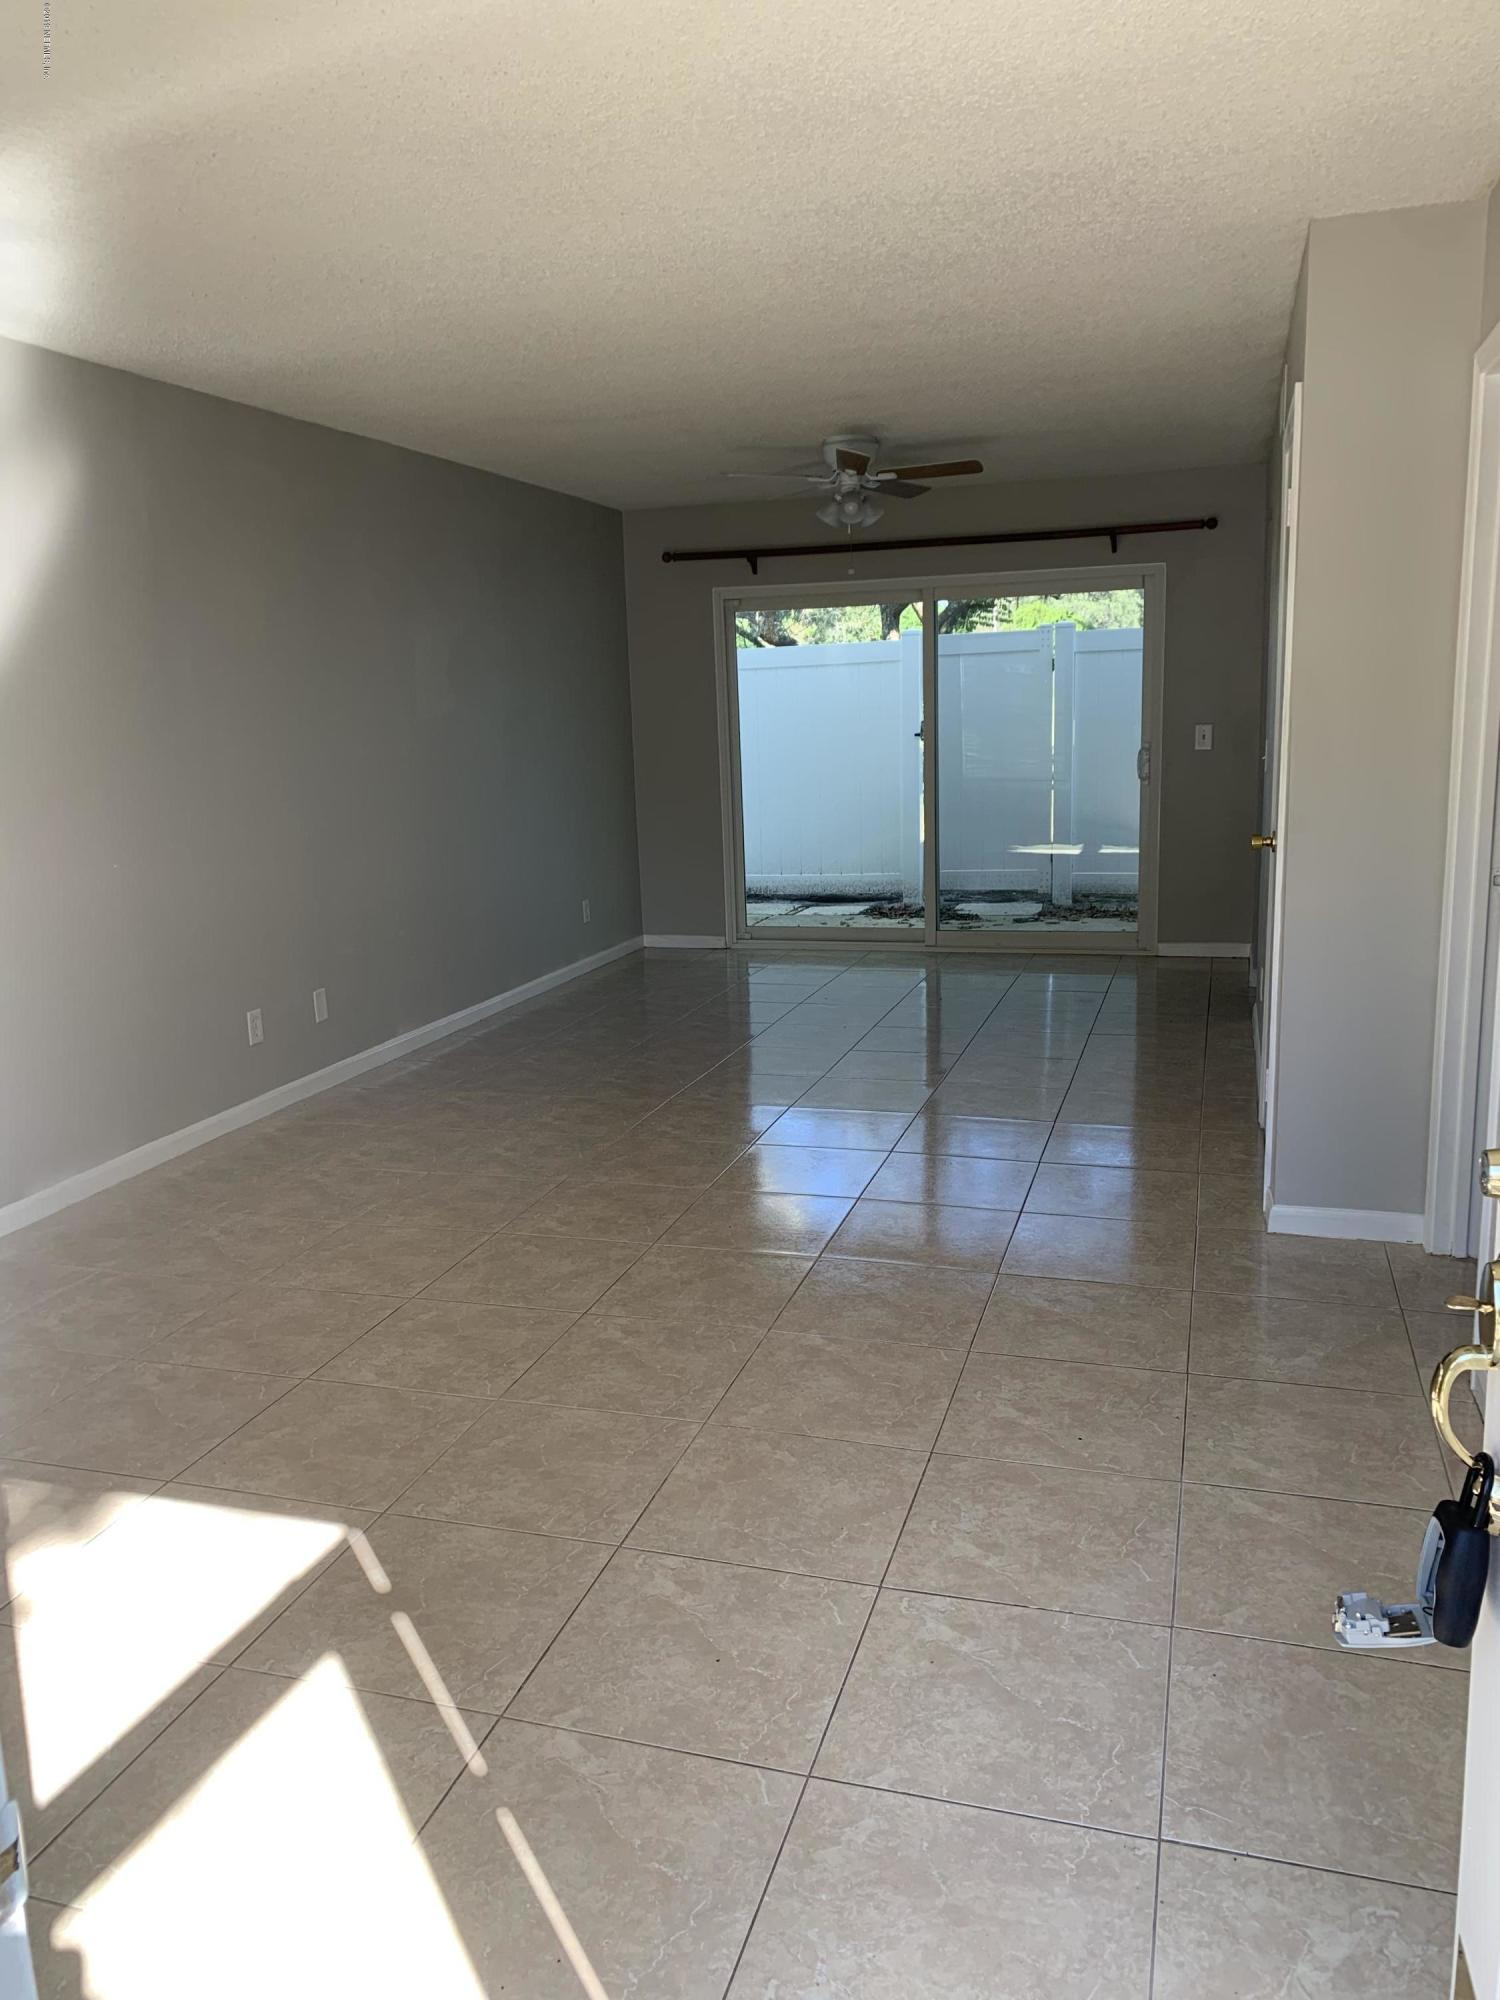 303 KETTERING, ORANGE PARK, FLORIDA 32073, 2 Bedrooms Bedrooms, ,1 BathroomBathrooms,Rental,For sale,KETTERING,1026168